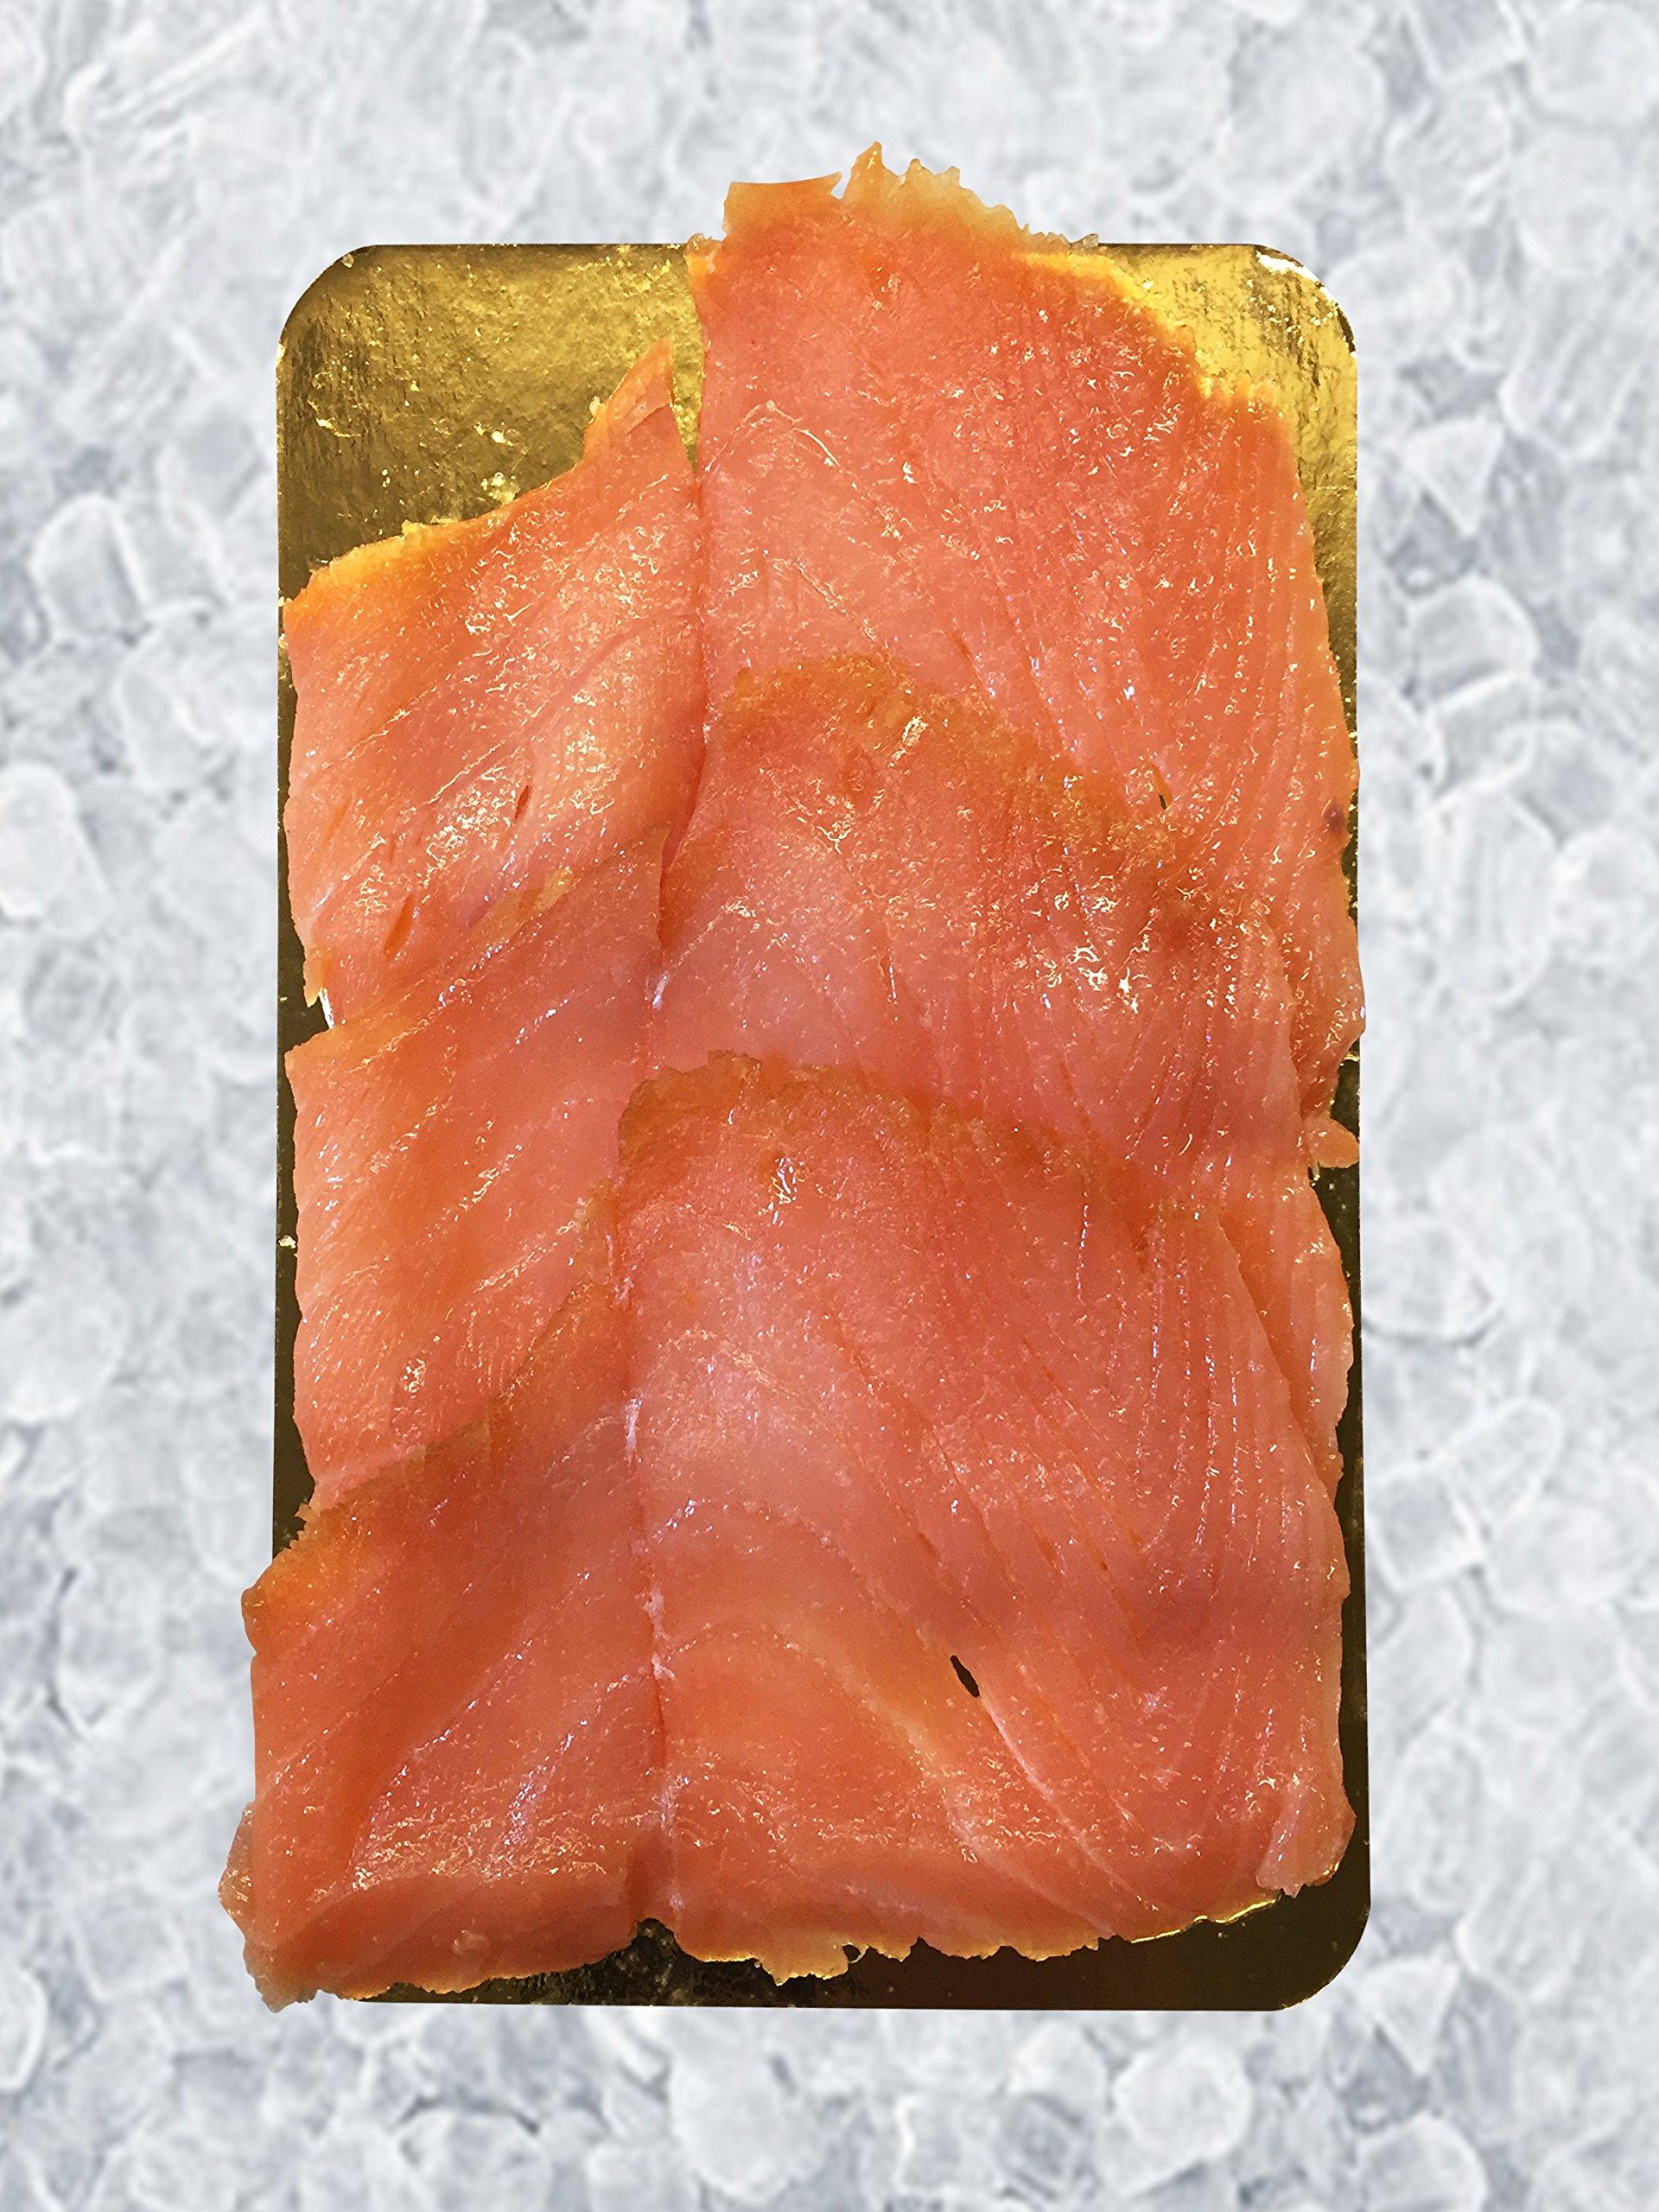 Sliced Norwegian Style Smoked Salmon, 12 Oz. PKG, 12 PCS by Banner Smoked Fish